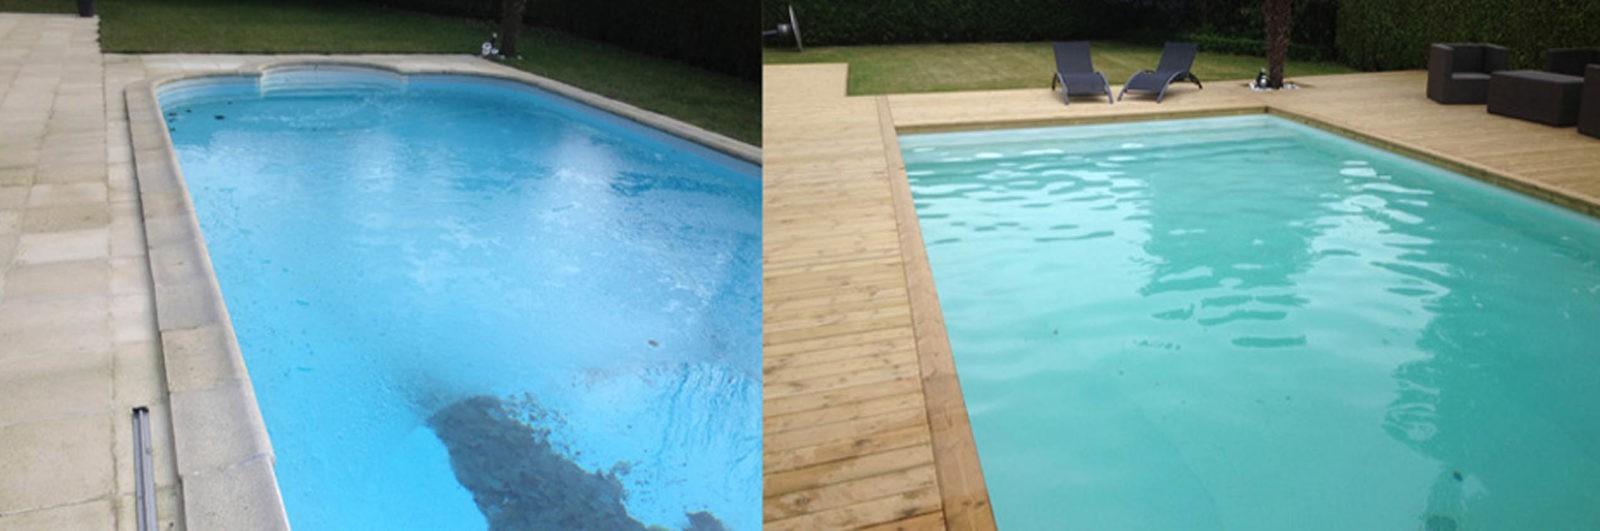 Rénovation piscine Pyrénées-orientales